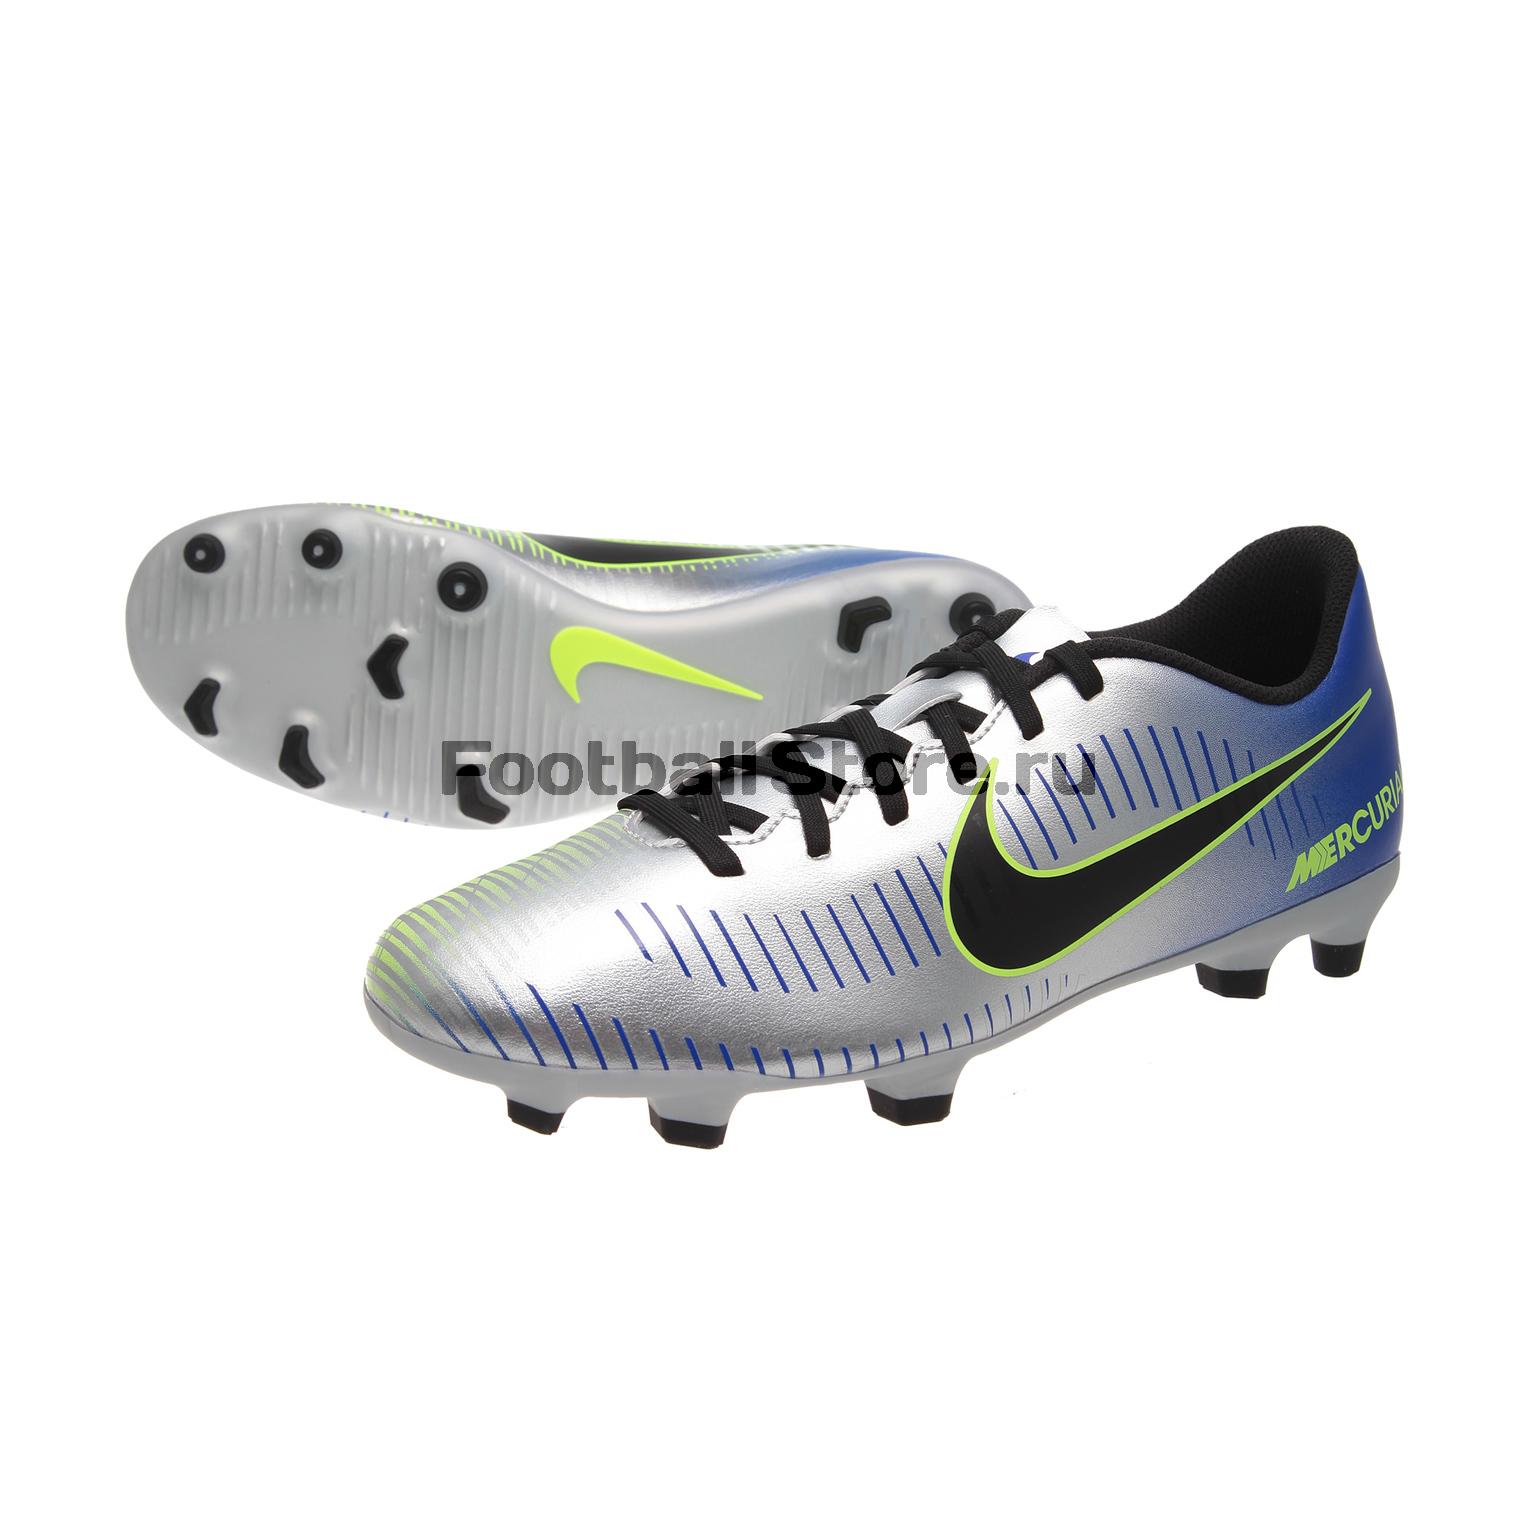 Игровые бутсы Nike Бутсы Nike Mercurial Vortex III Neymar FG 921511-407 nike nike mercurial lite